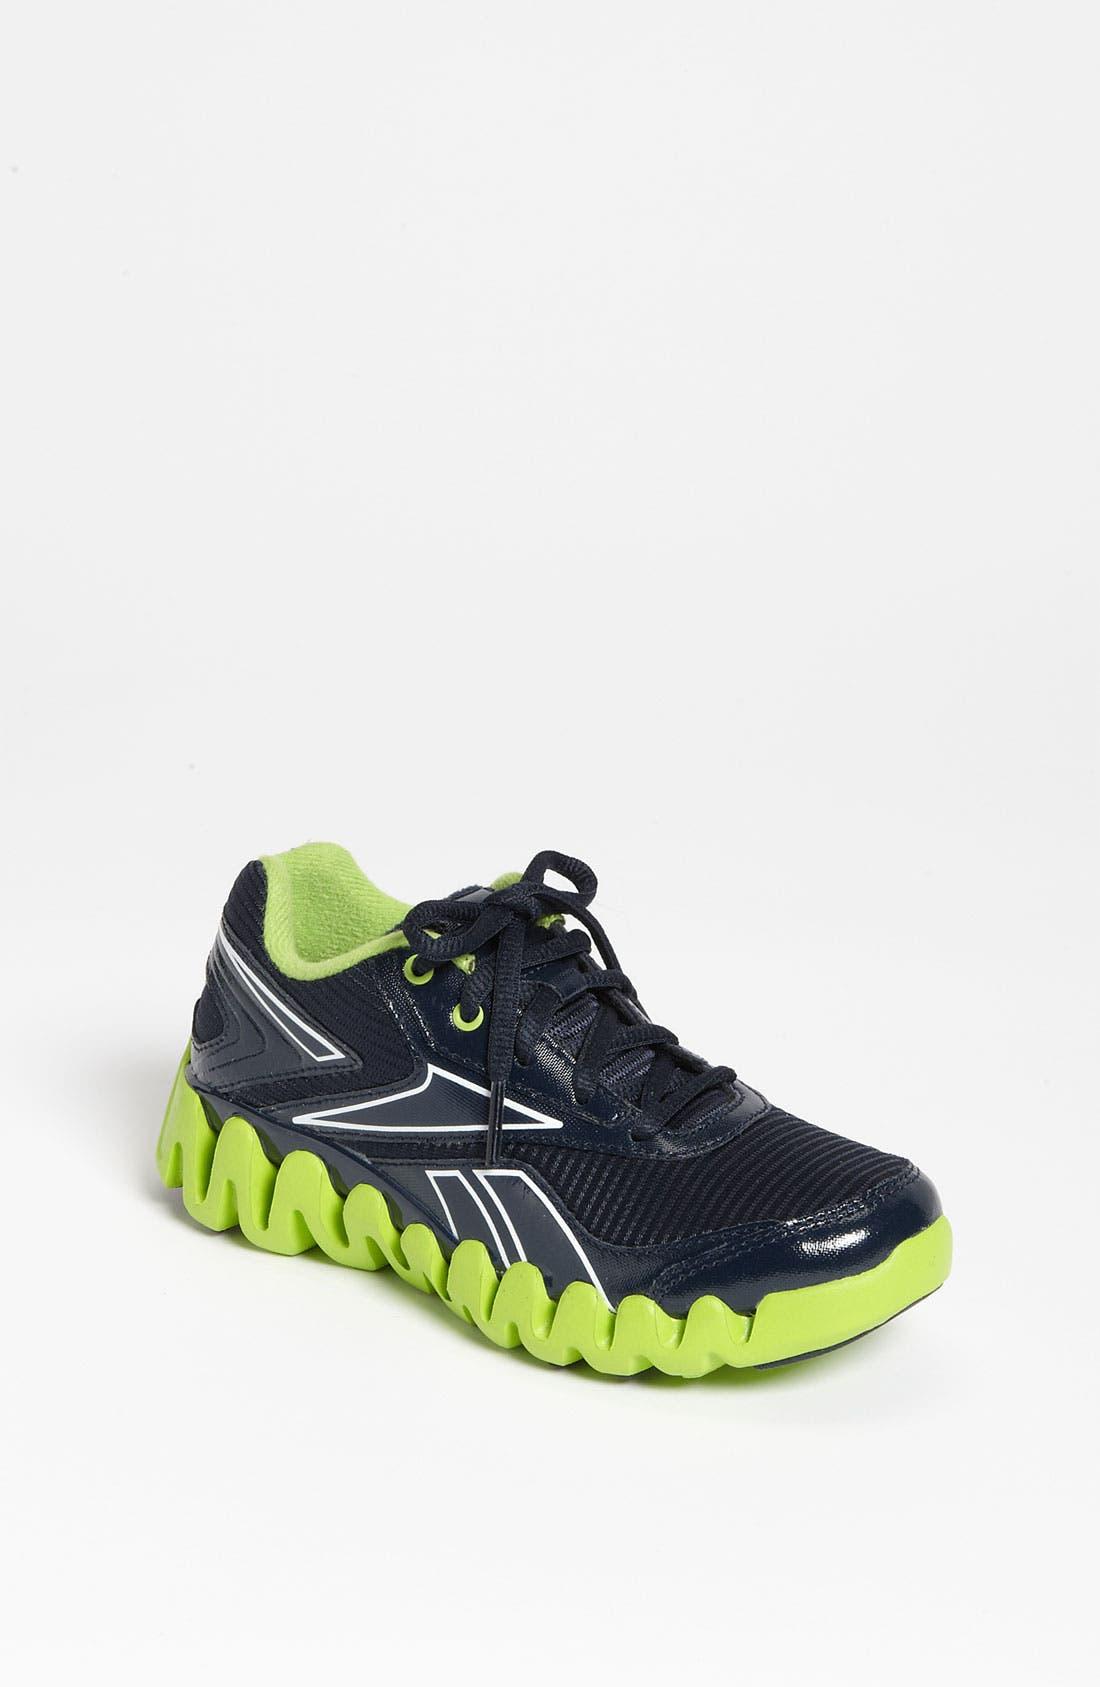 Alternate Image 1 Selected - Reebok 'ZigActivate' Running Shoe (Toddler, Little Kid & Big Kid)